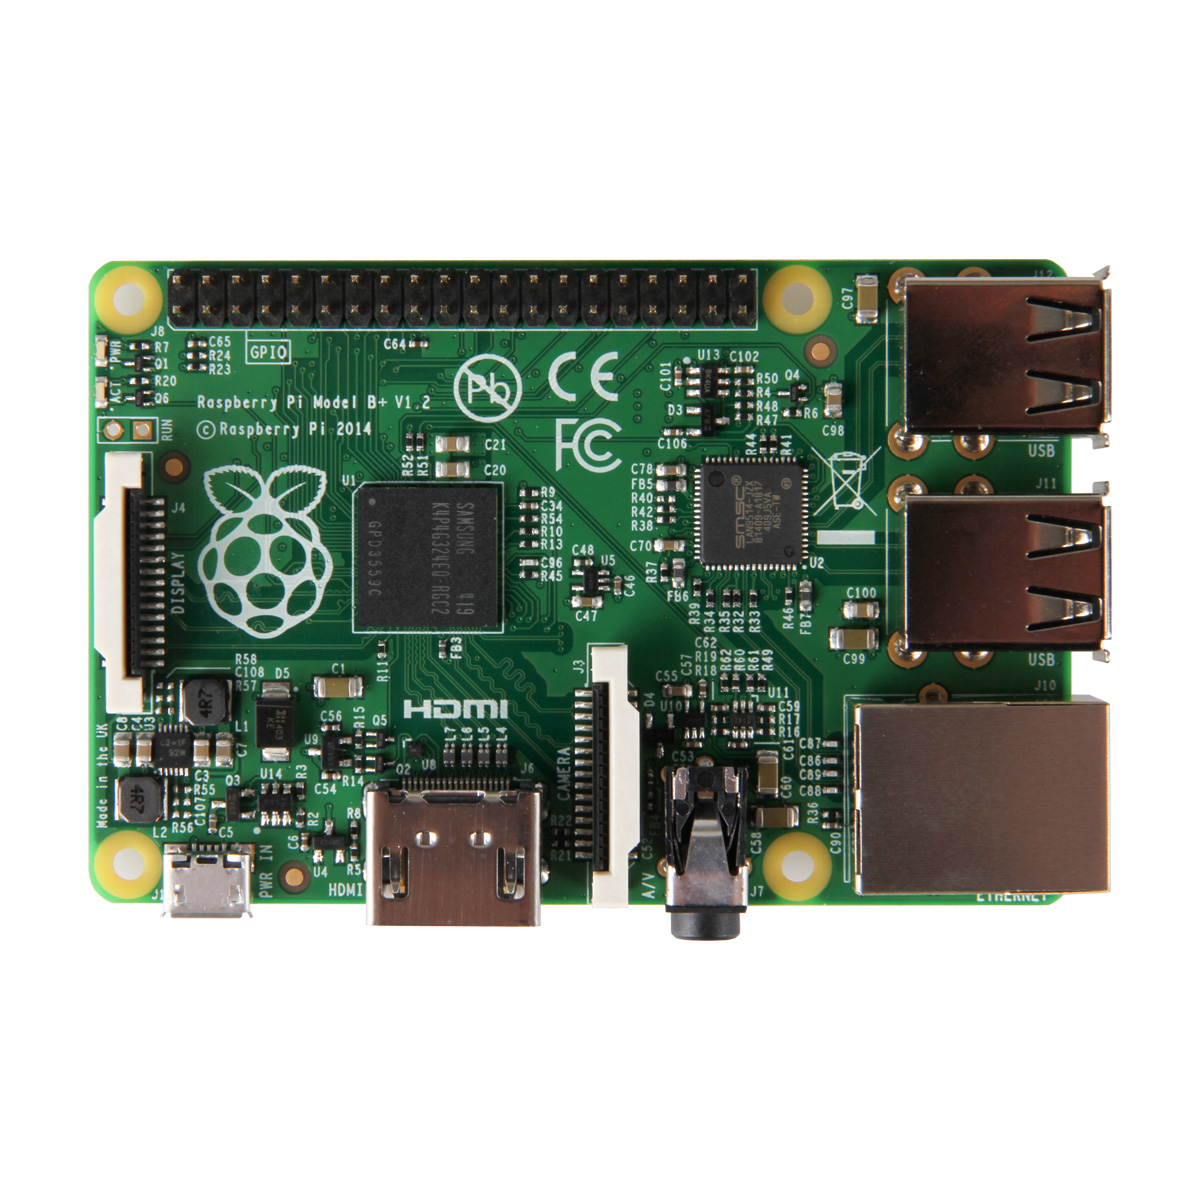 Carte mère Raspberry Pi Model B+ Carte mère avec processeur ARM1176VZF-S core  - RAM 512 Mo - VideoCore IV - RJ45 - HDMI - 4x USB 2.0